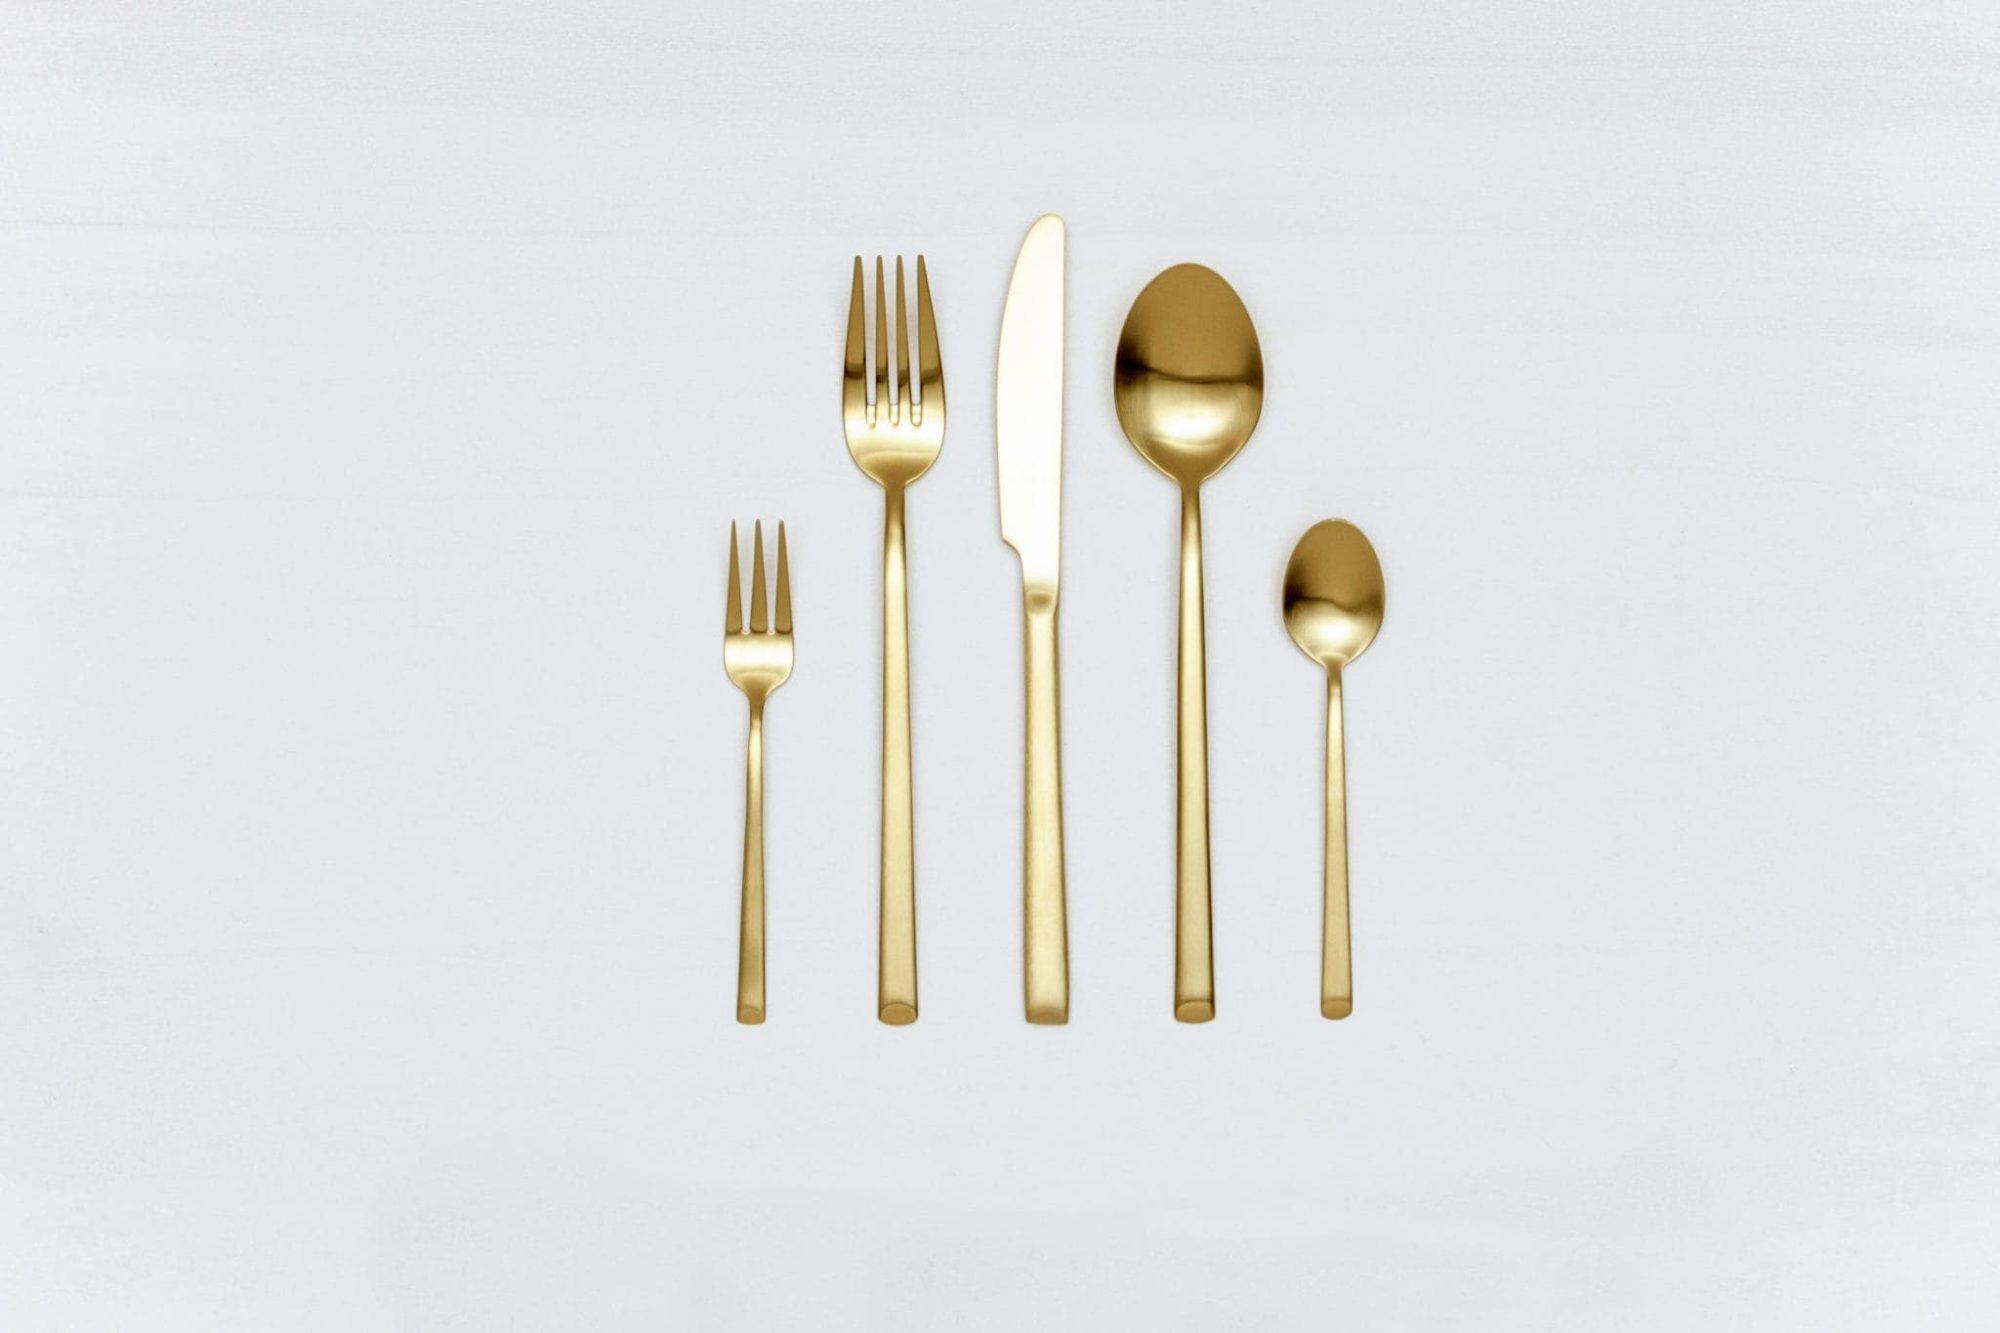 Besteck Set Ines Gold Matt 5 Teilig Gotvintage Rental Event Design